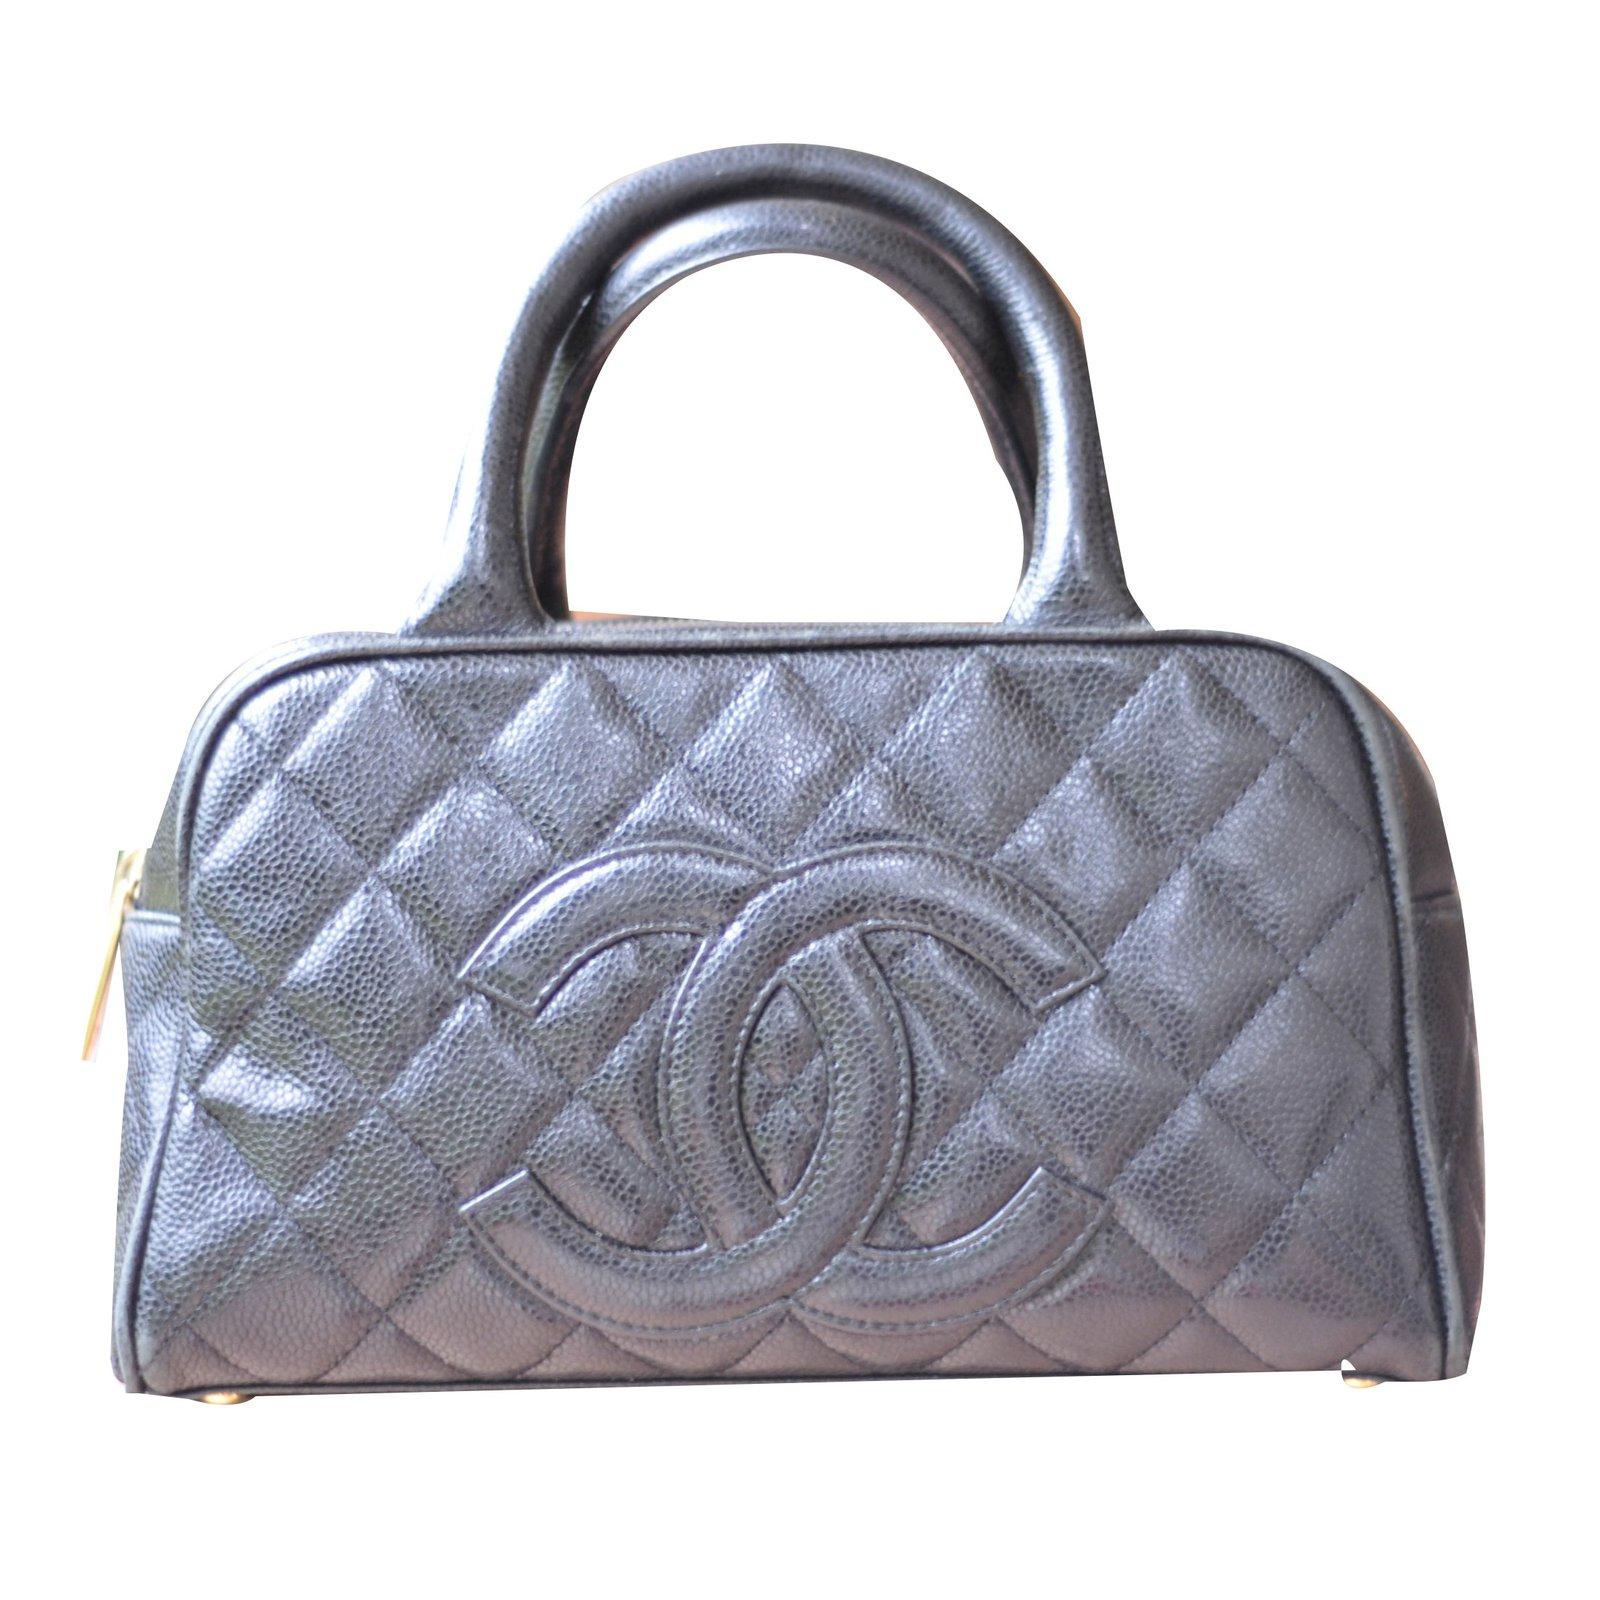 Chanel Bowling Bag Handbags Leather Black Ref 47311